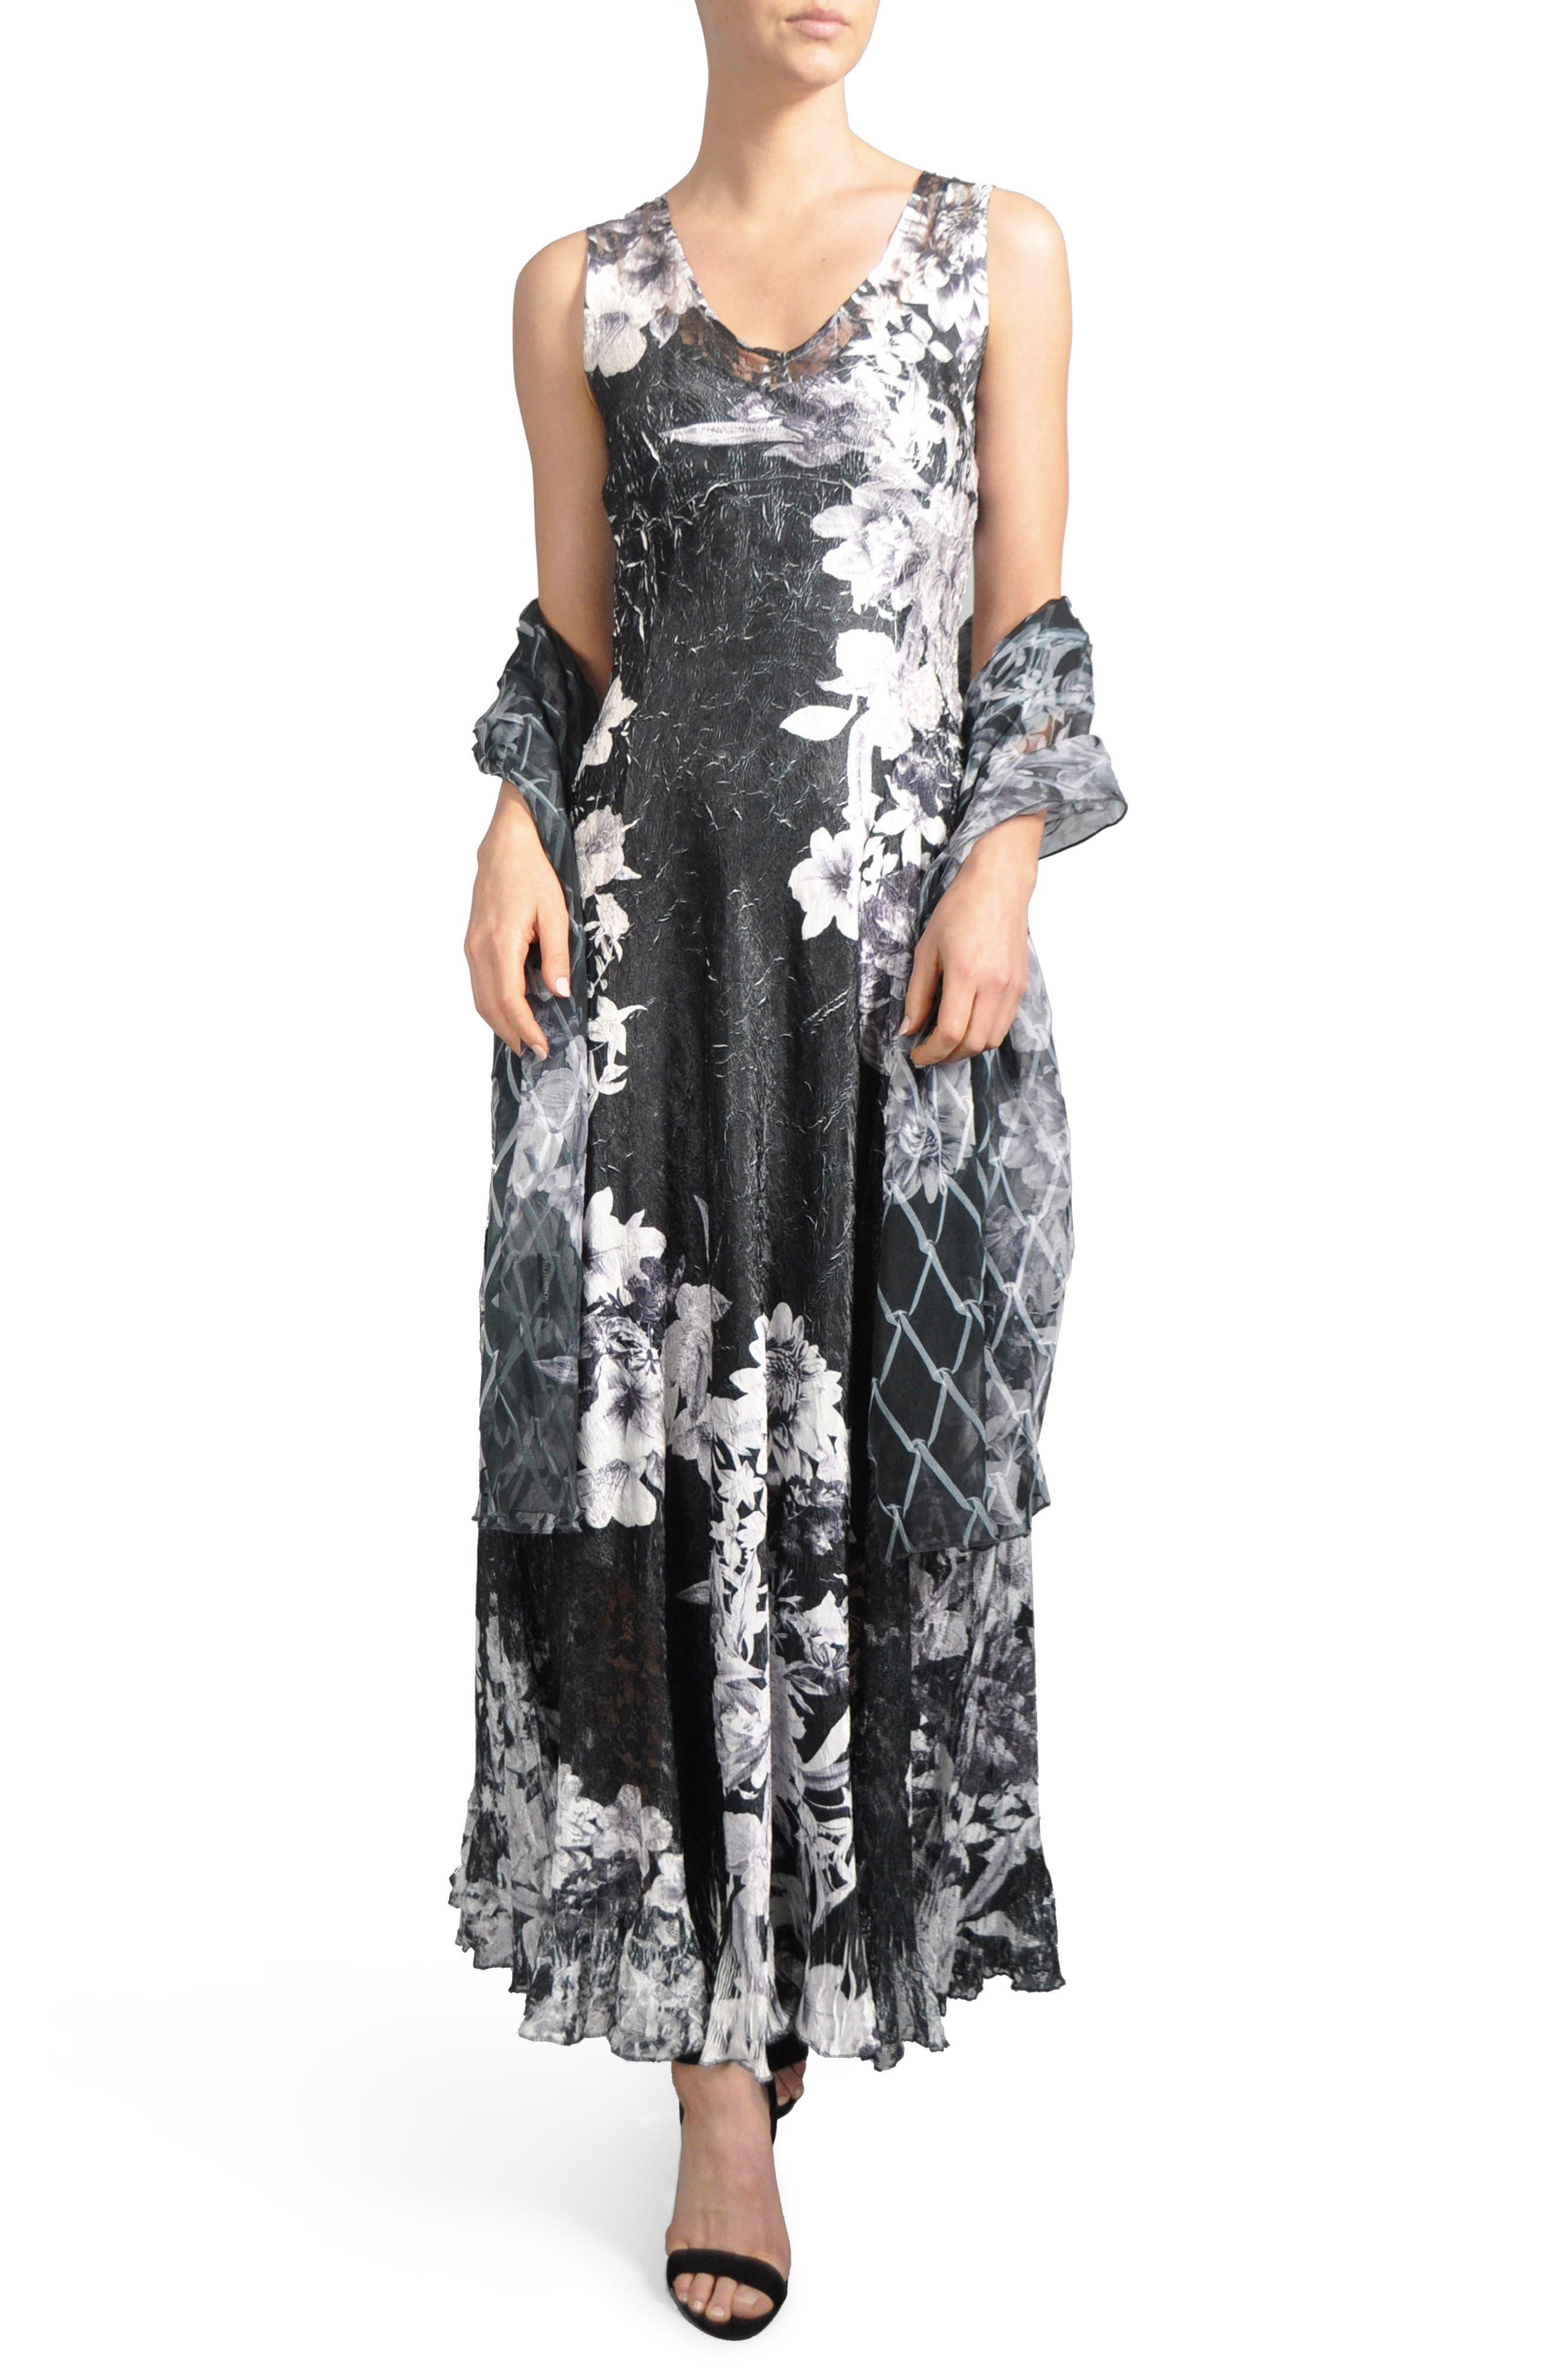 Main Image - Komarov Lace-Up Back Dress with Wrap